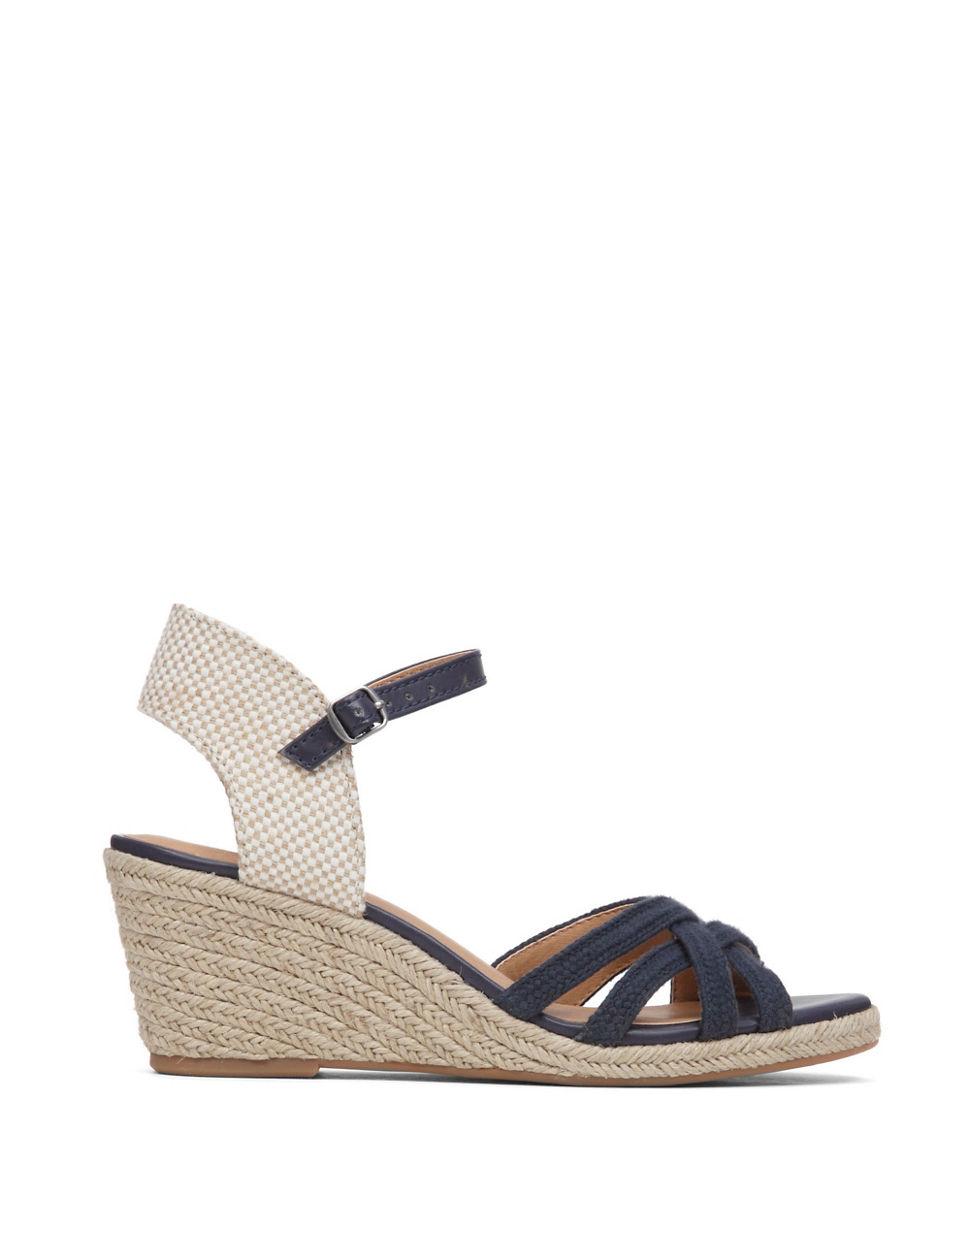 lucky brand kalley3 espadrille wedge sandals in blue lyst